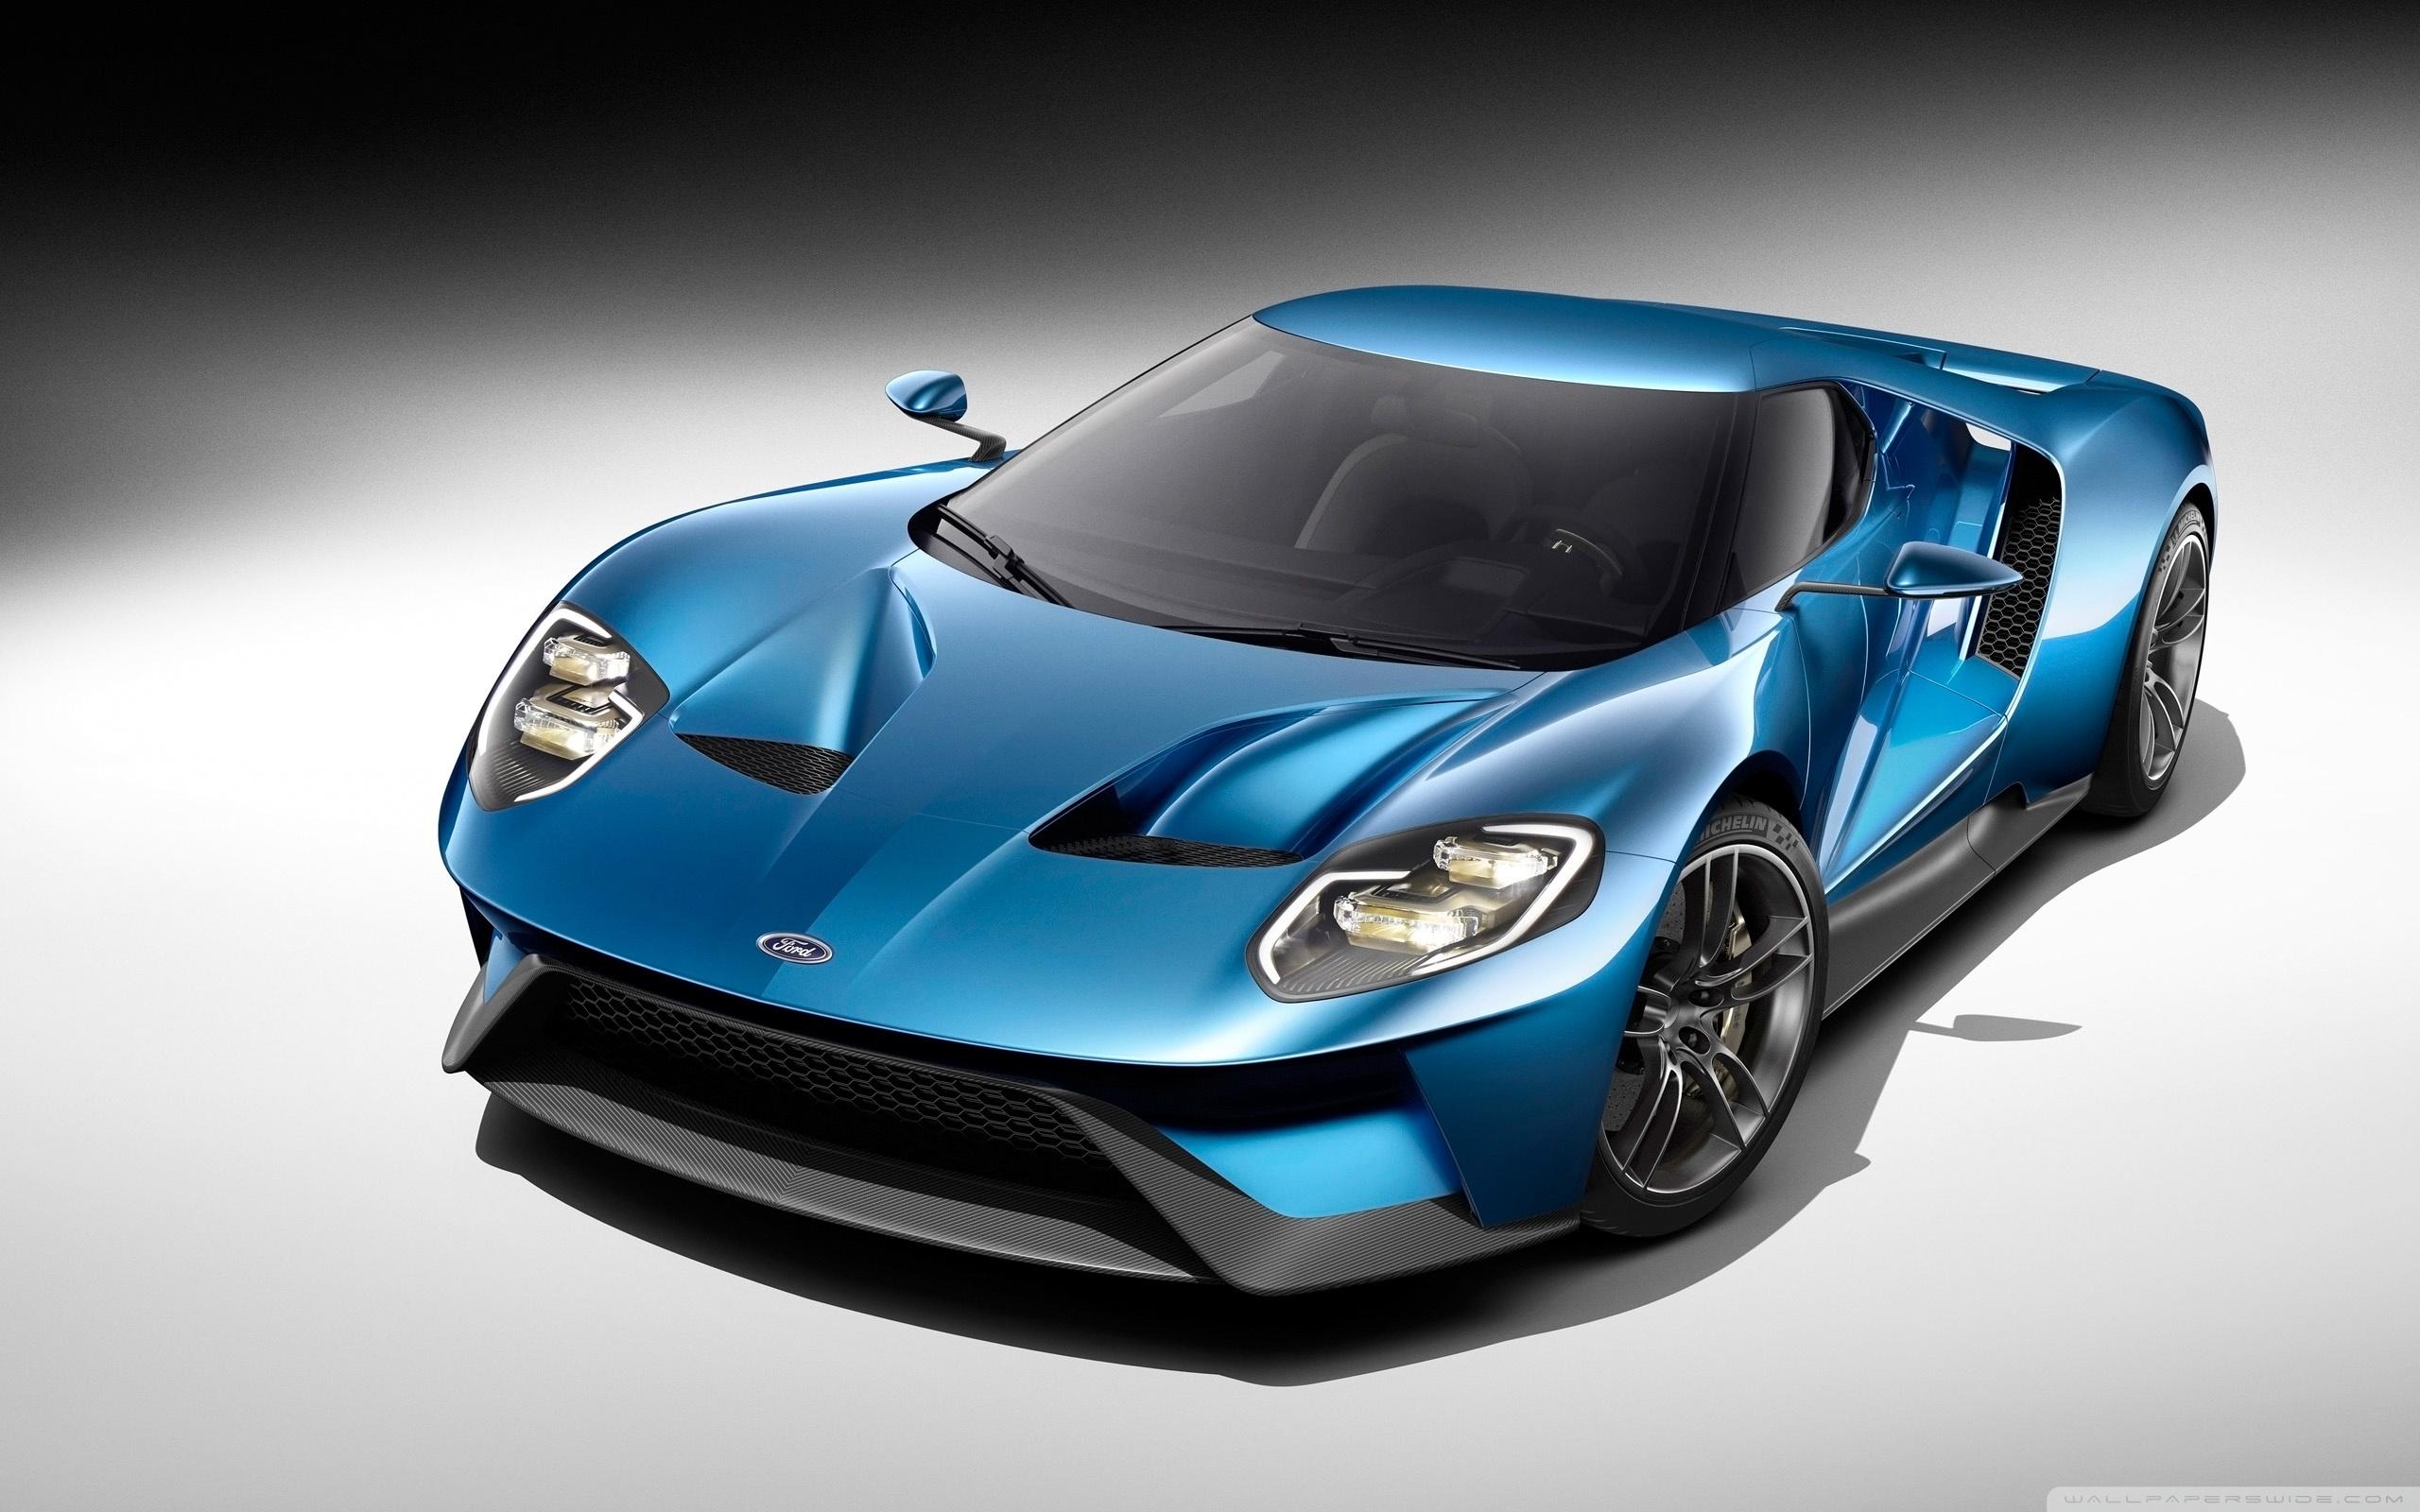 2017 Ford GT Blue Car 4K HD Desktop Wallpaper for 4K Ultra HD 2560x1600